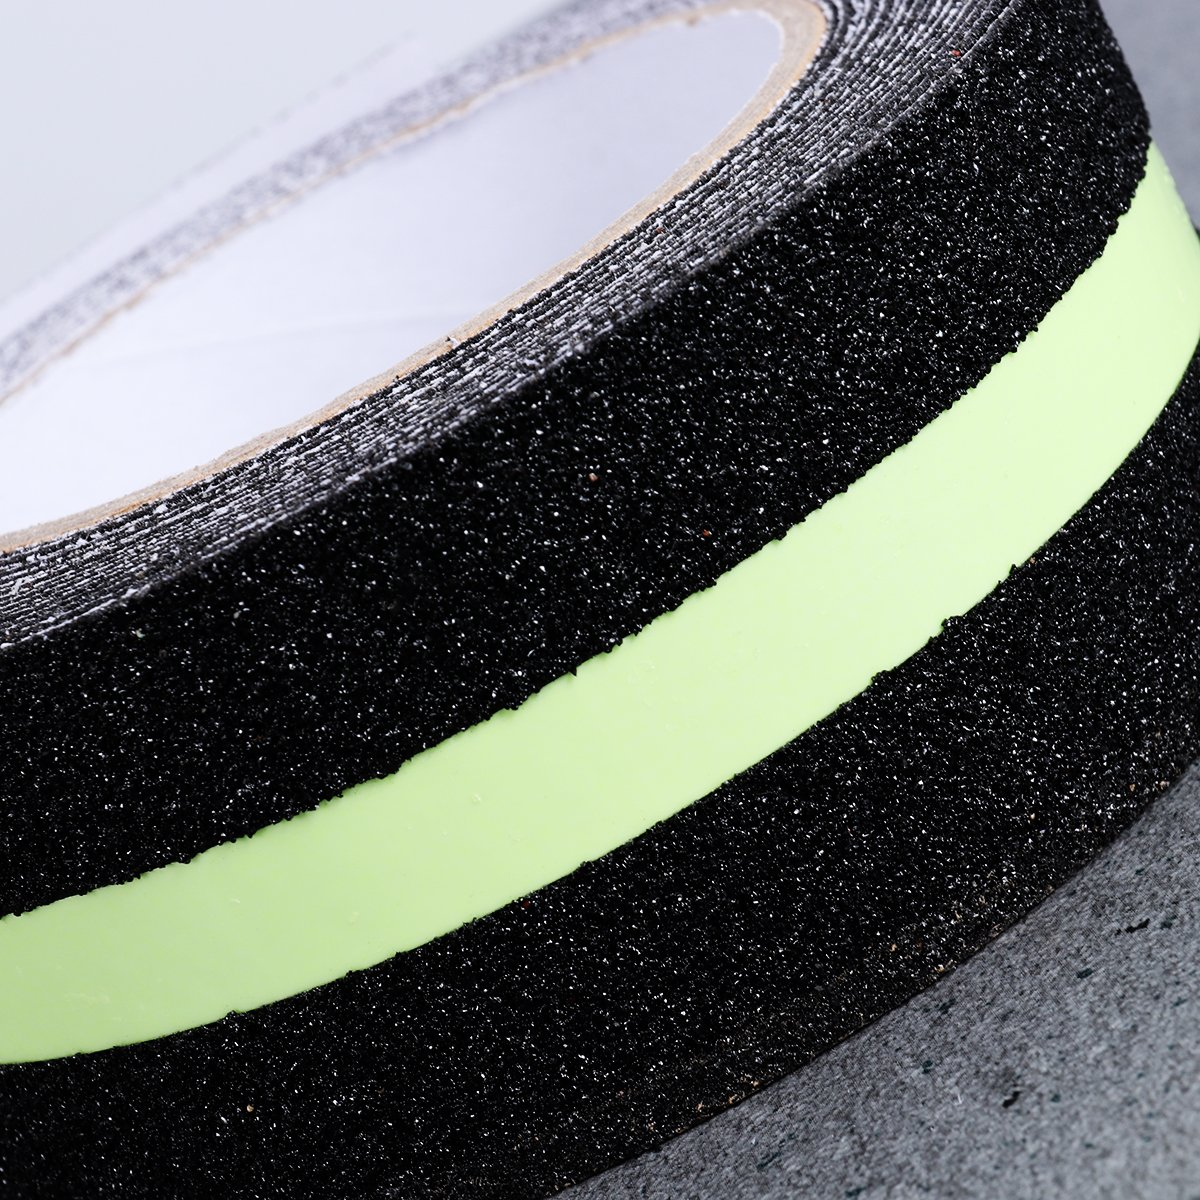 ueetek antideslizante cinta de seguridad verde fluorescente antideslizante cinta de seguridad 2/pulgadas por 16.4/ft interior o exterior aplicable